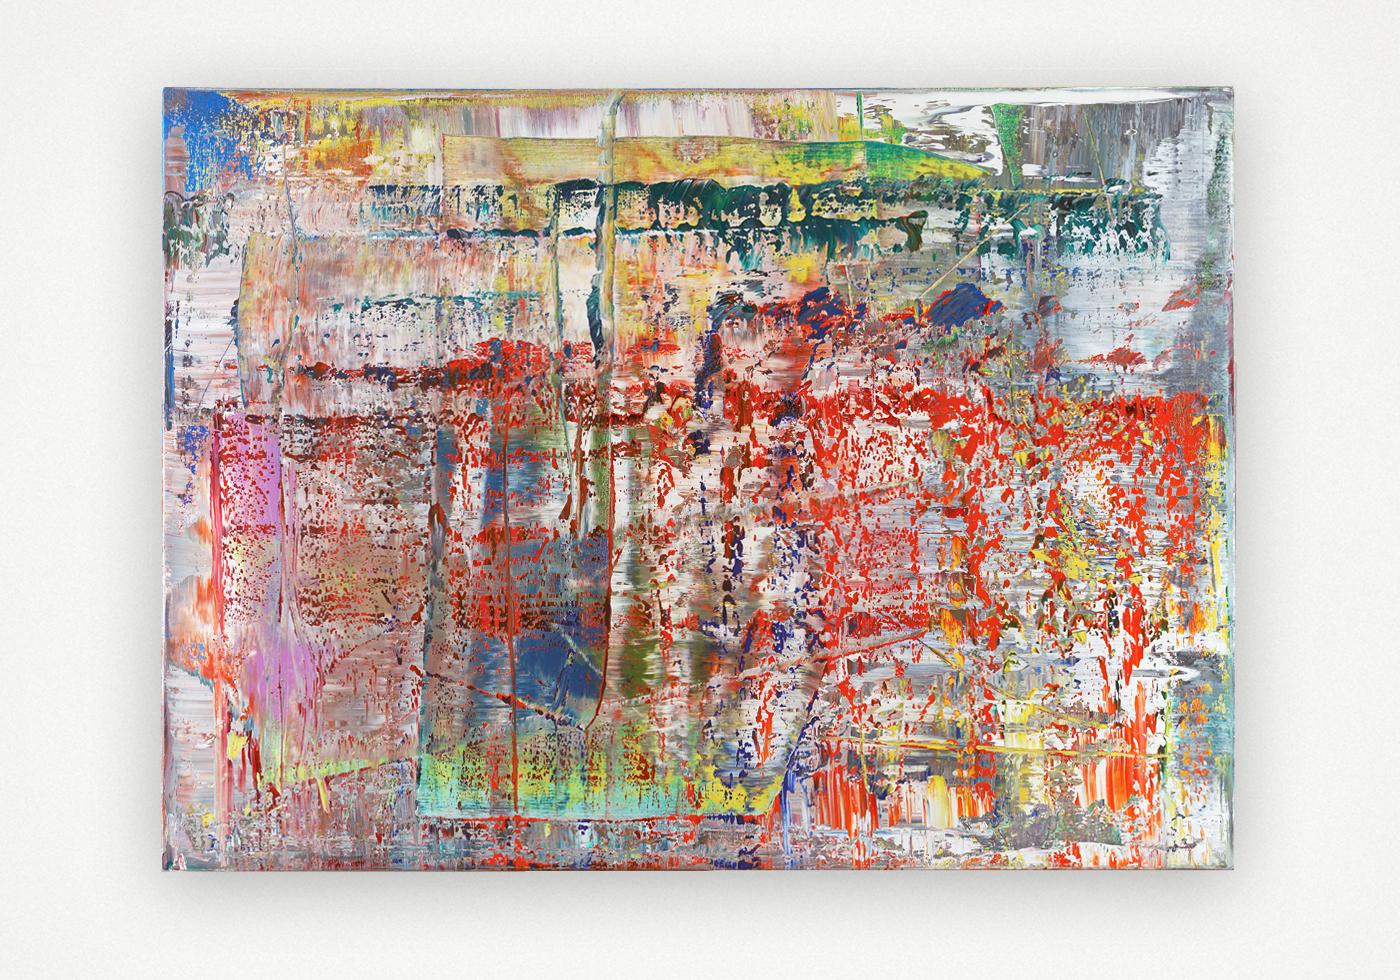 Richter_AbstraktesBild_724-4